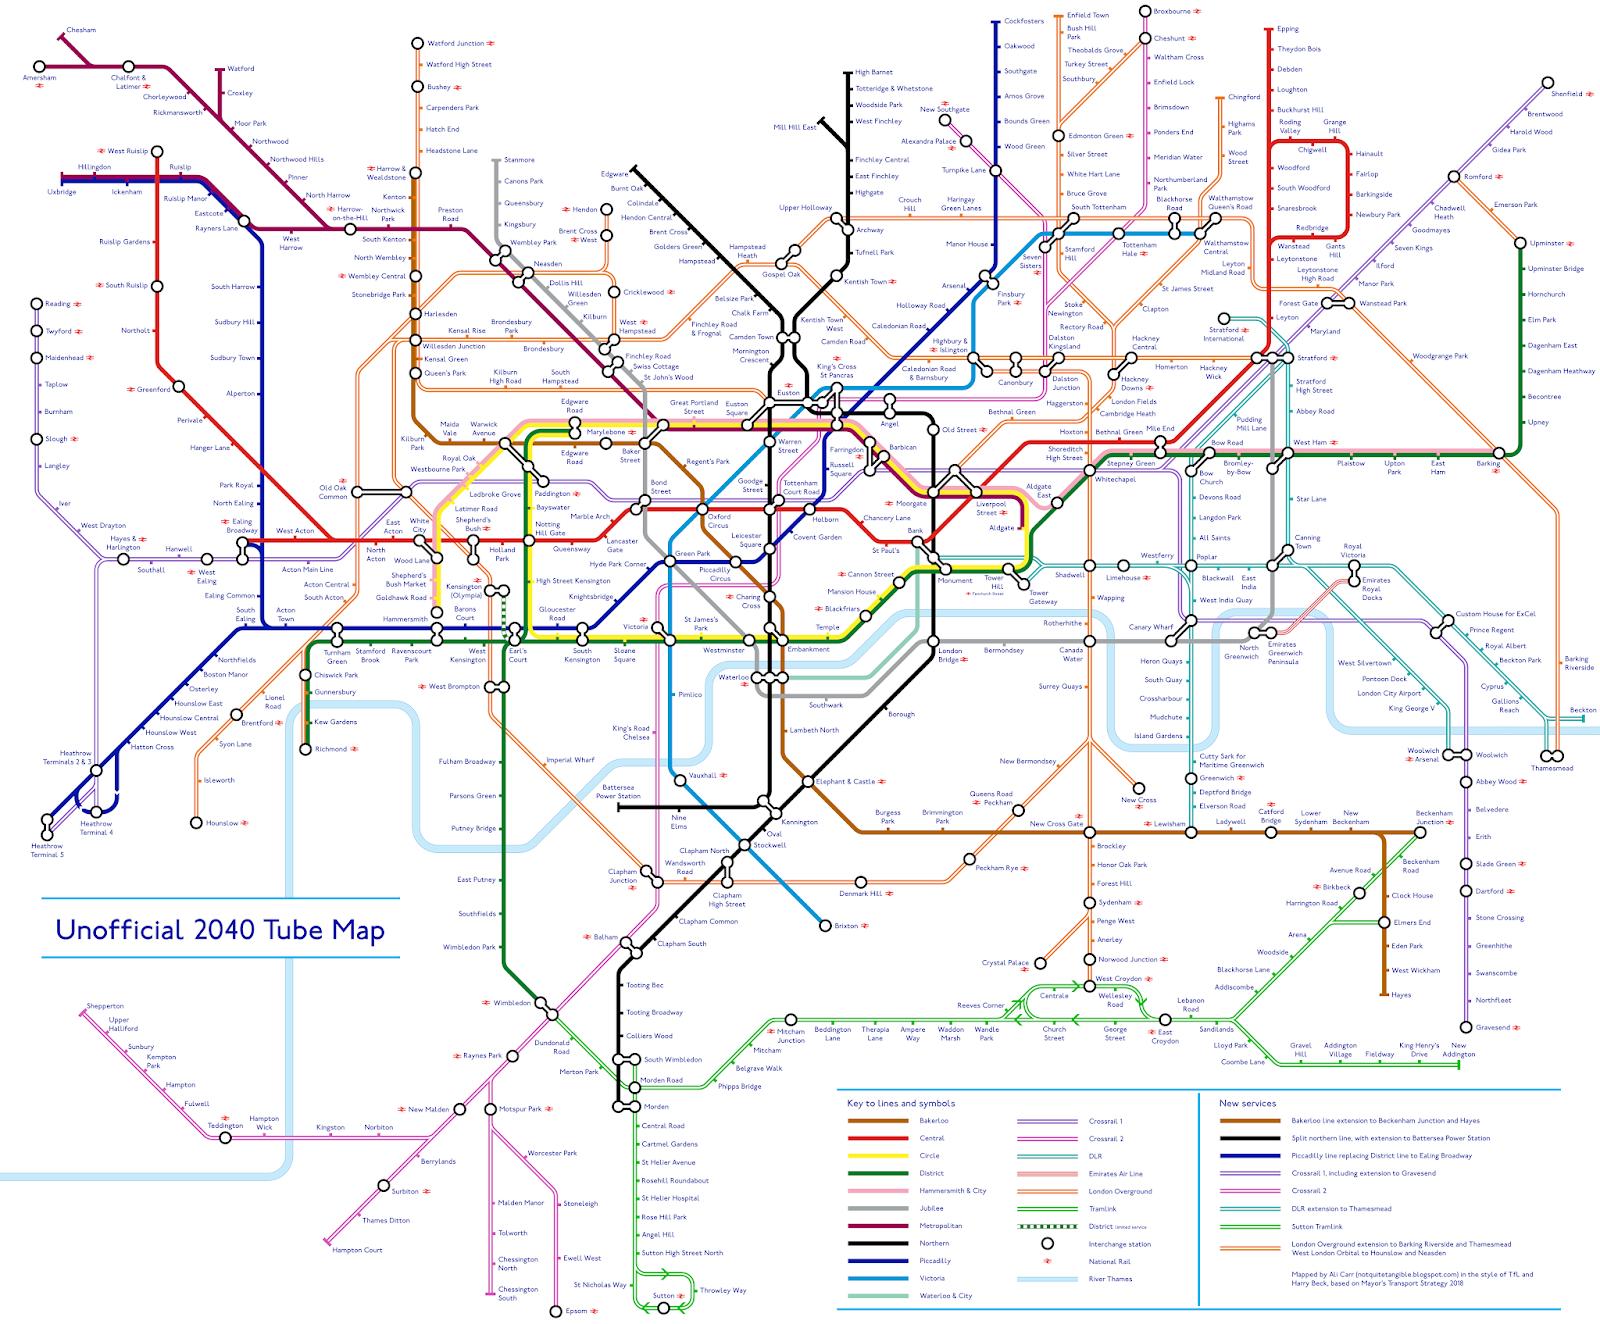 2040 Tube Map